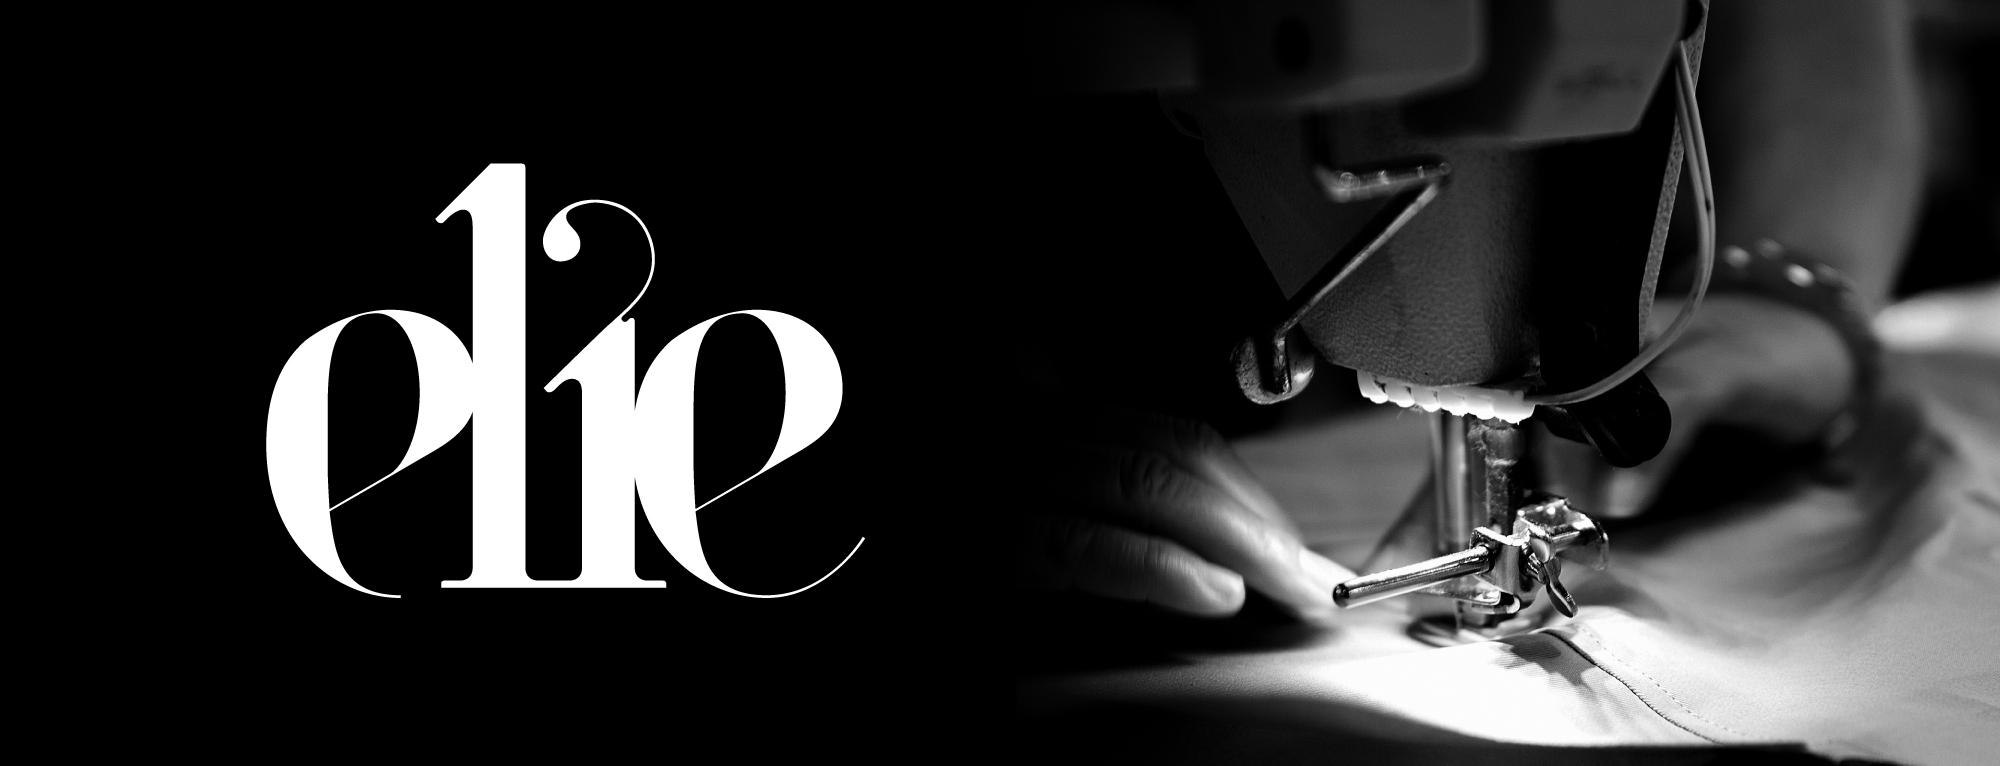 Elie Lifestyles Logo Design   Identity Design